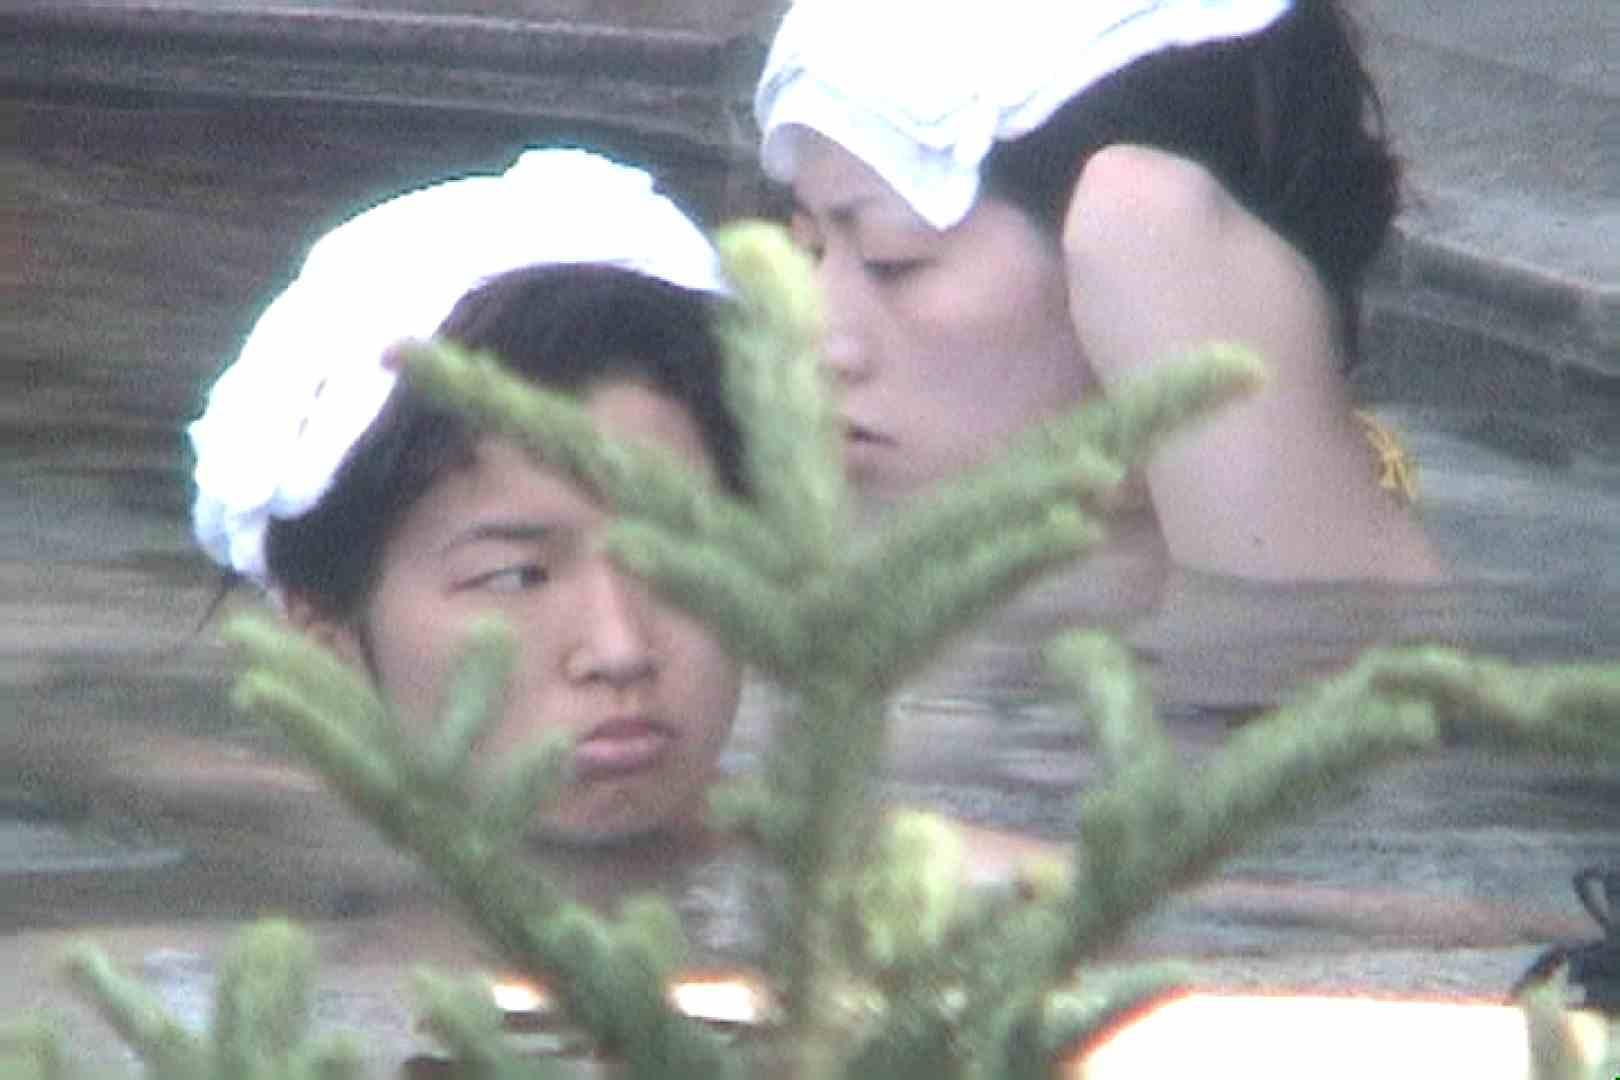 Aquaな露天風呂Vol.80【VIP限定】 露天風呂編  76PIX 6